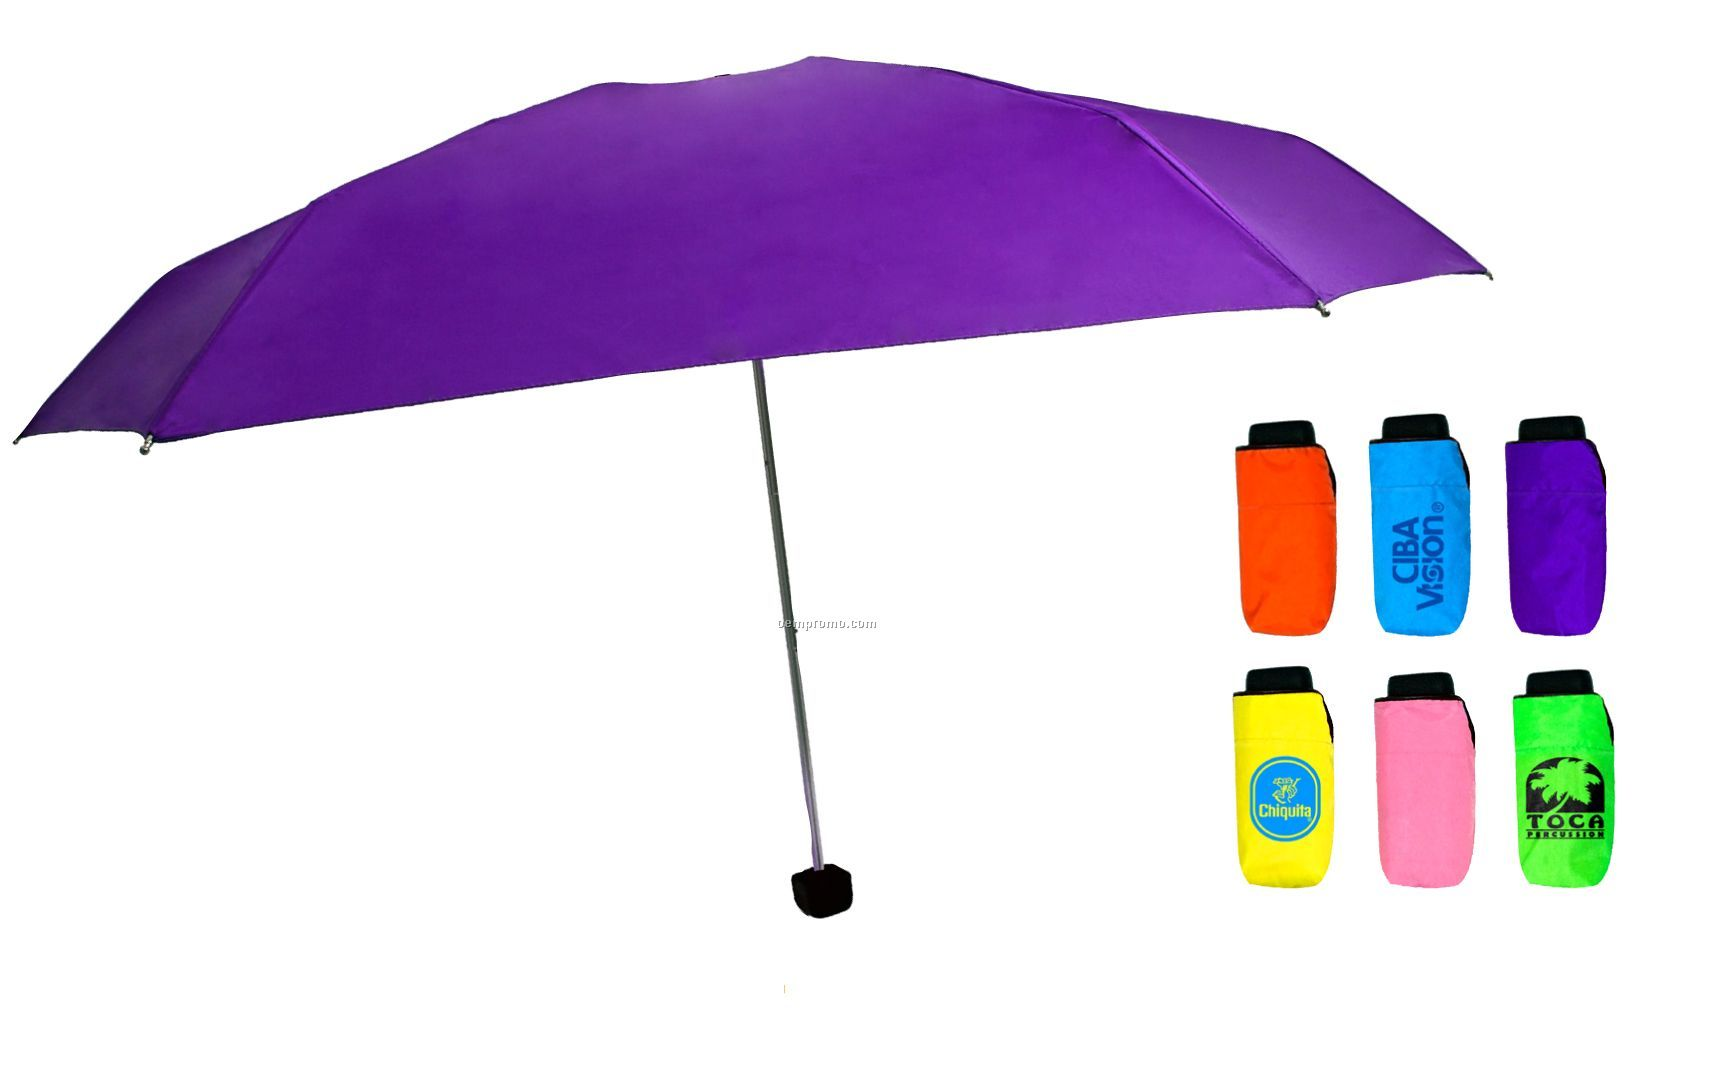 Merry Micro Folding Umbrella (Screen Printed)